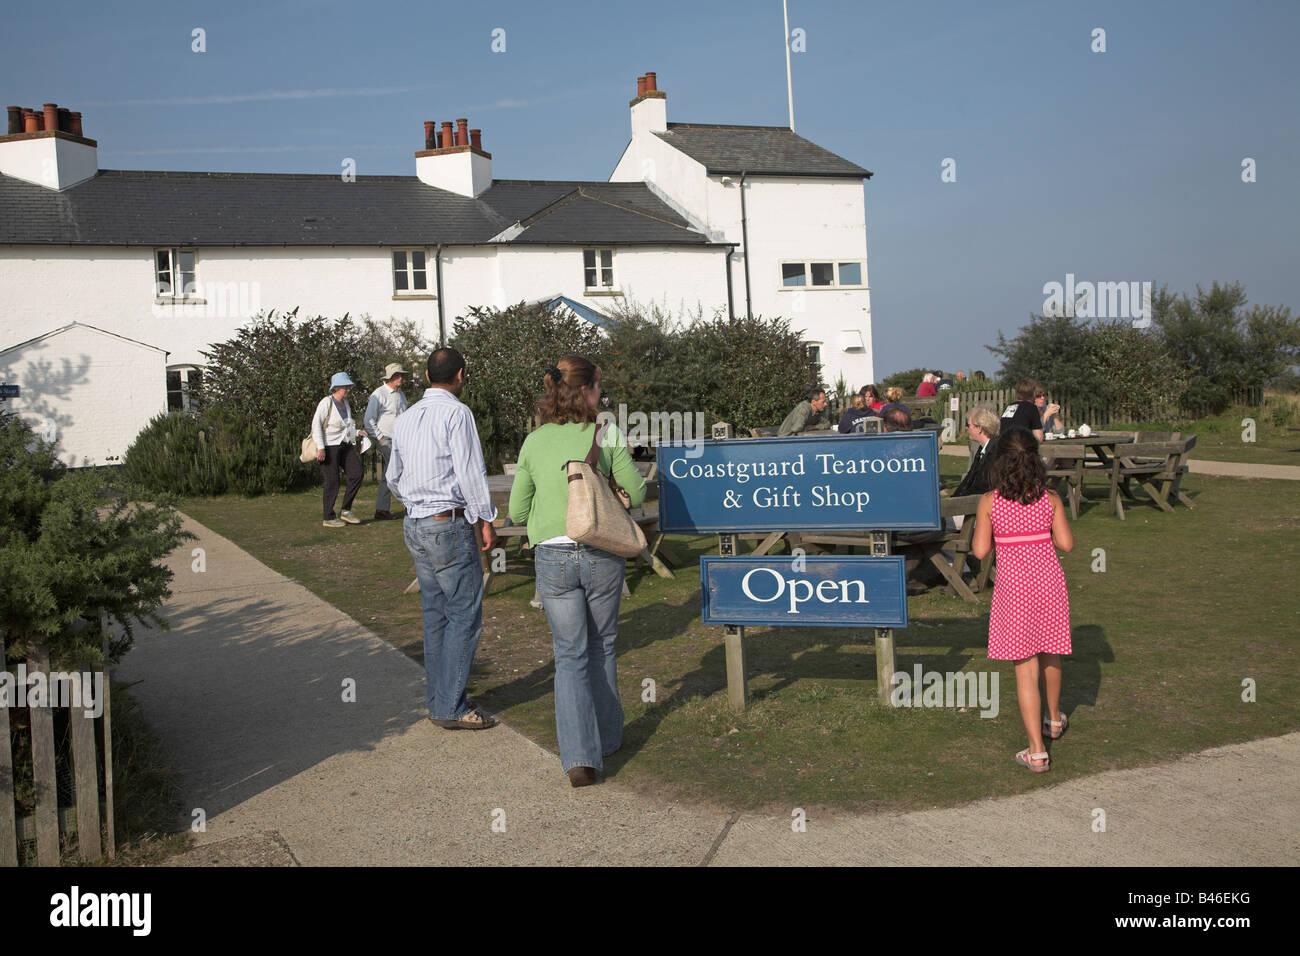 Coastguard Tearoom and Gift Shop, Dunwich Heath, Suffolk, England - Stock Image